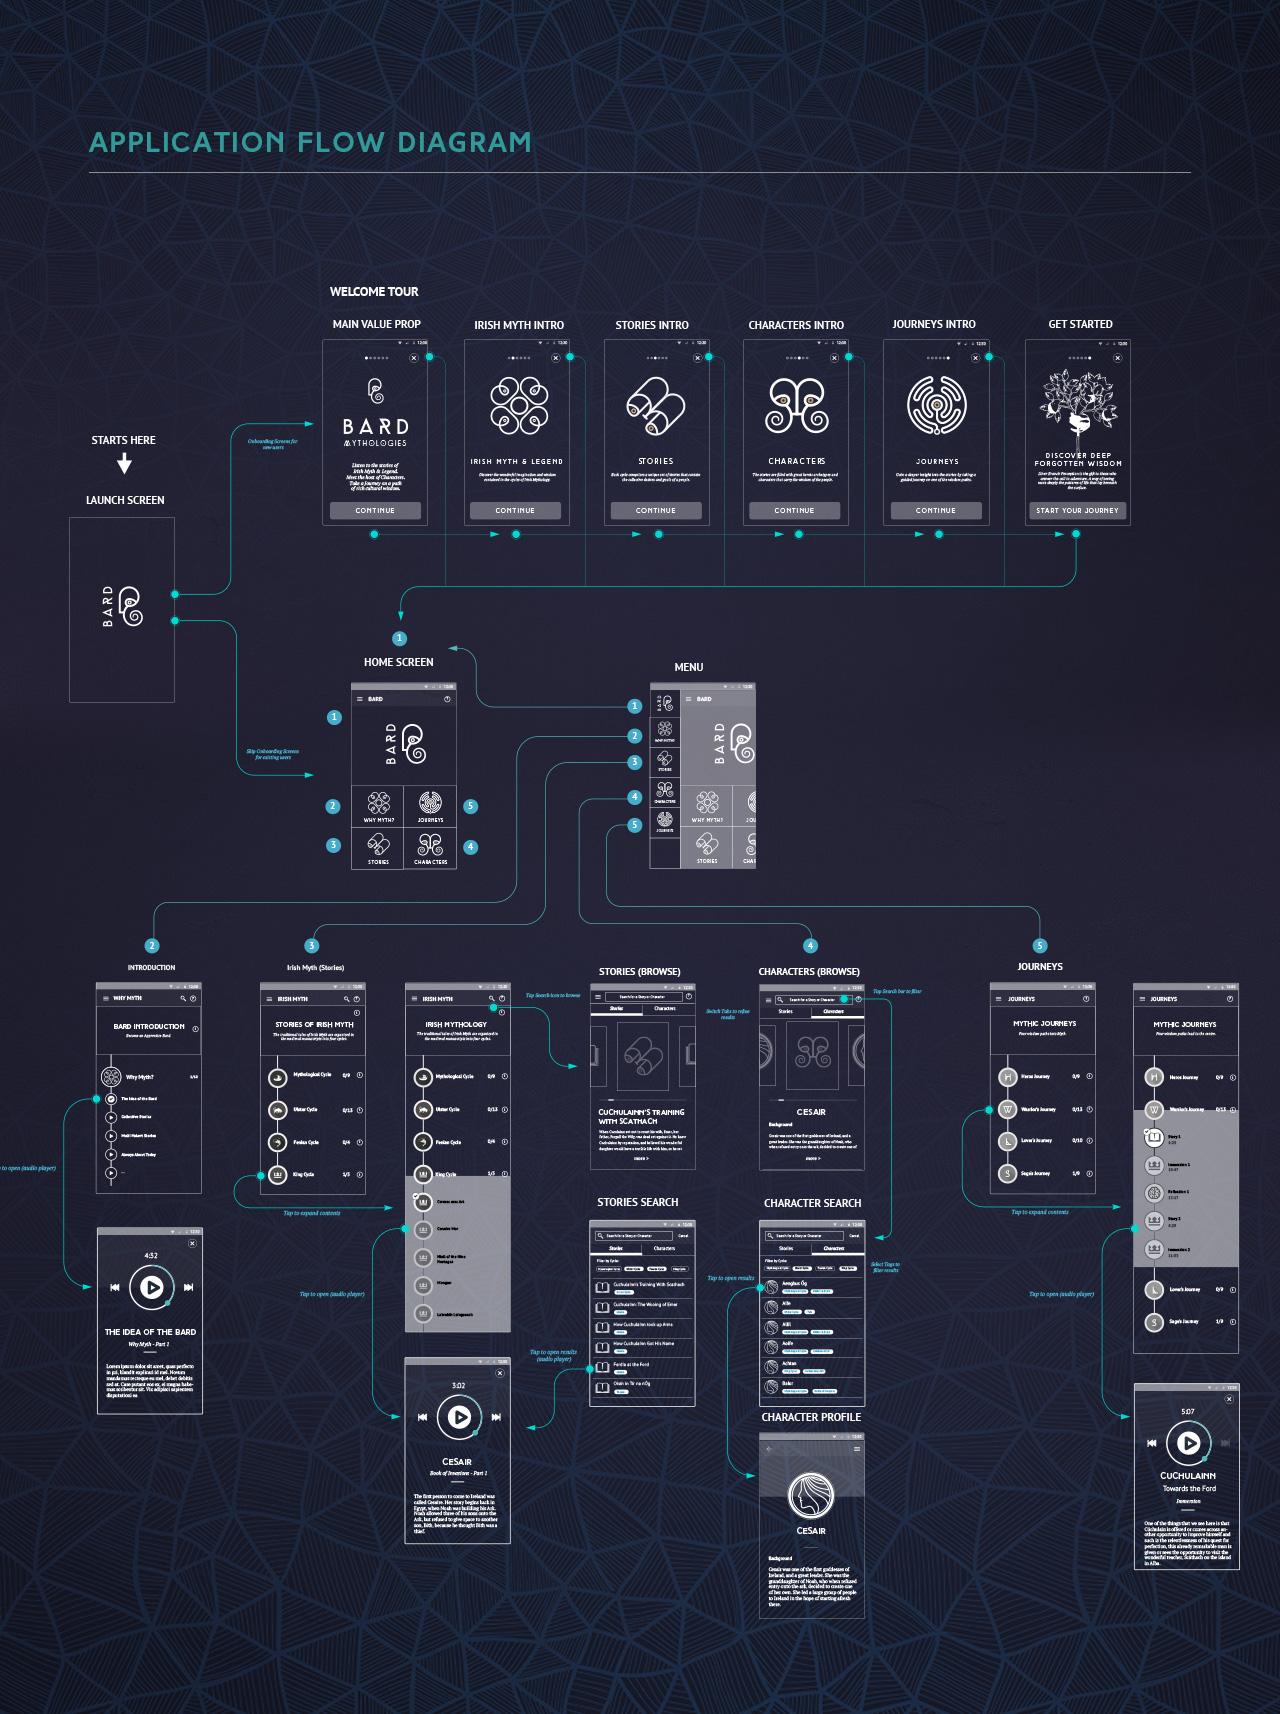 bard_app-flow